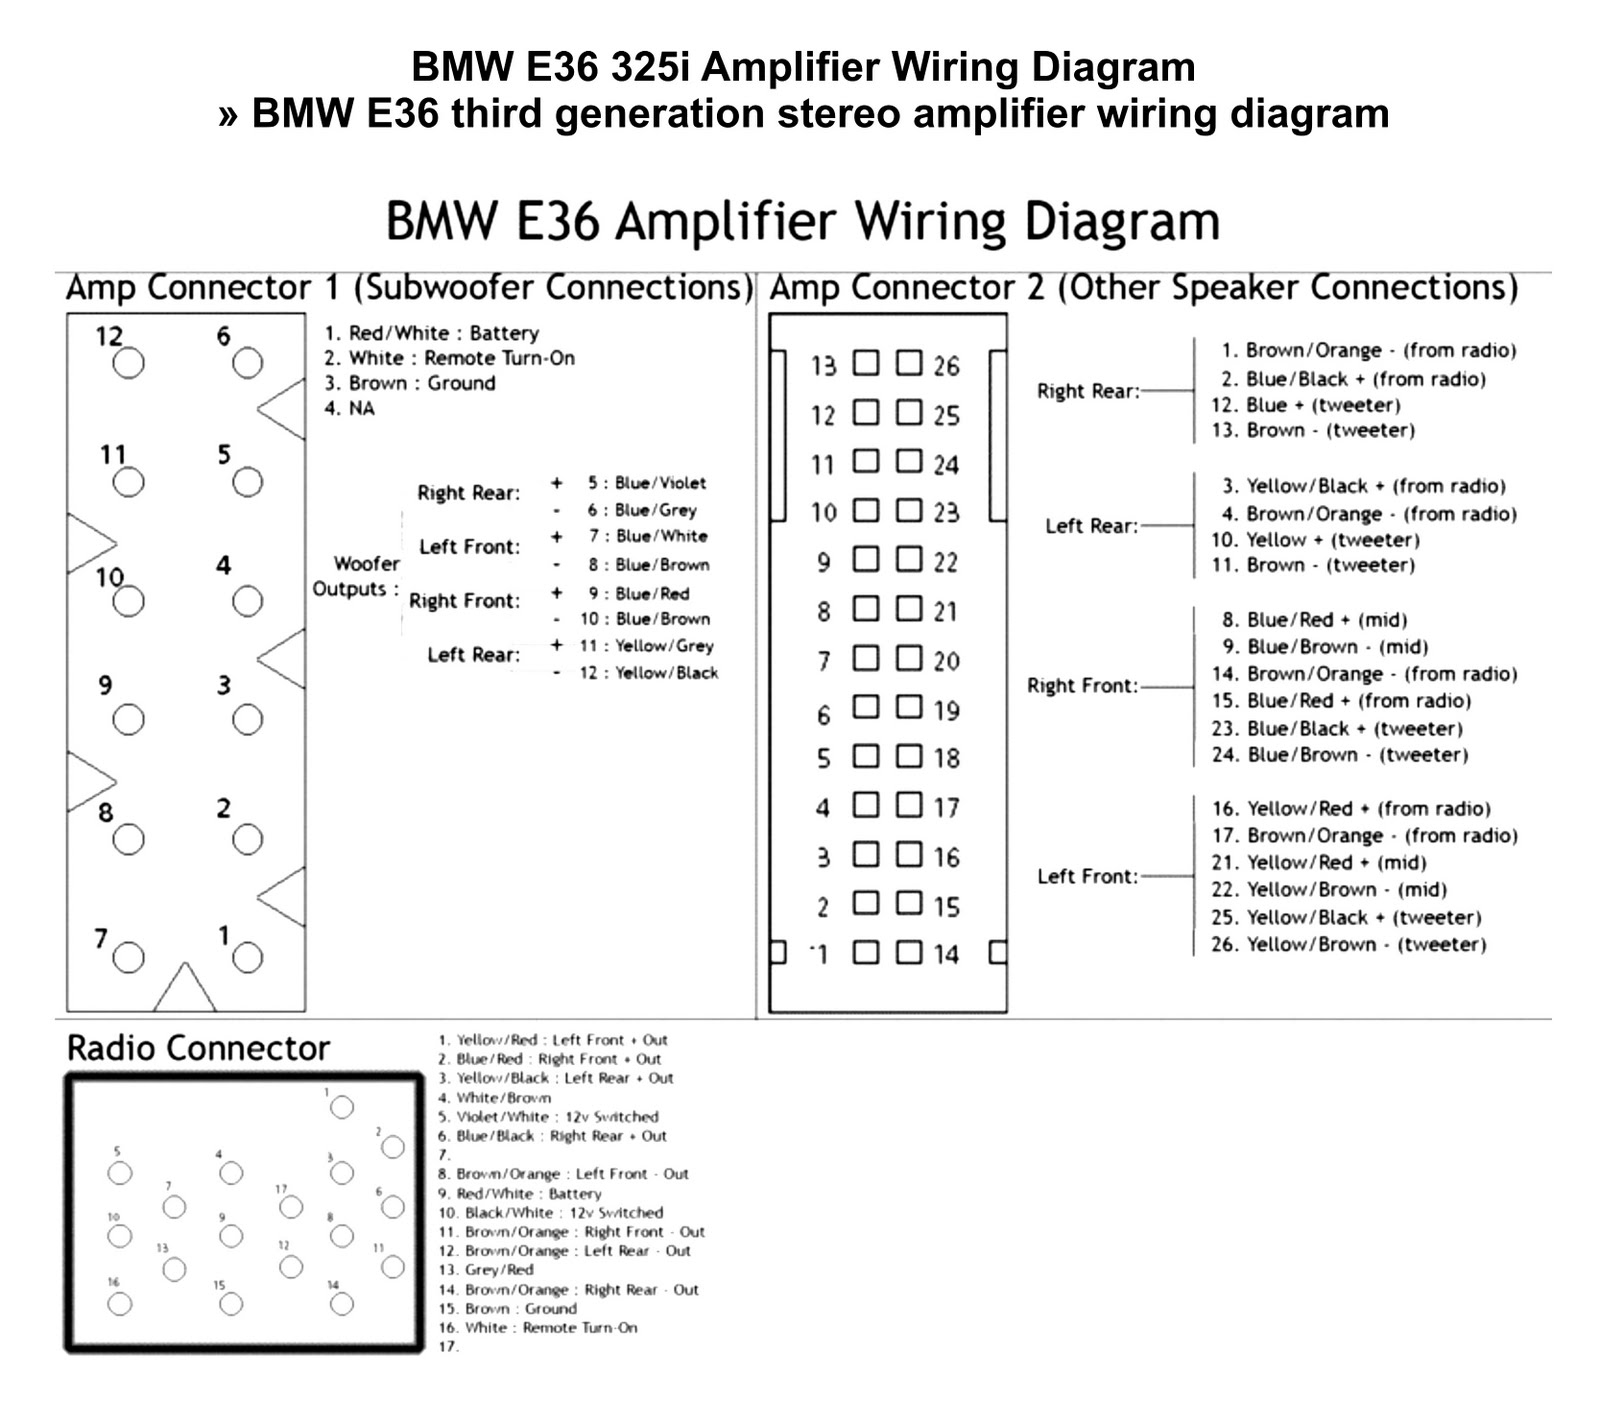 Z3 E36 Wiring Diagram Schematics Dme Library Bmw Radio Awesome Speaker